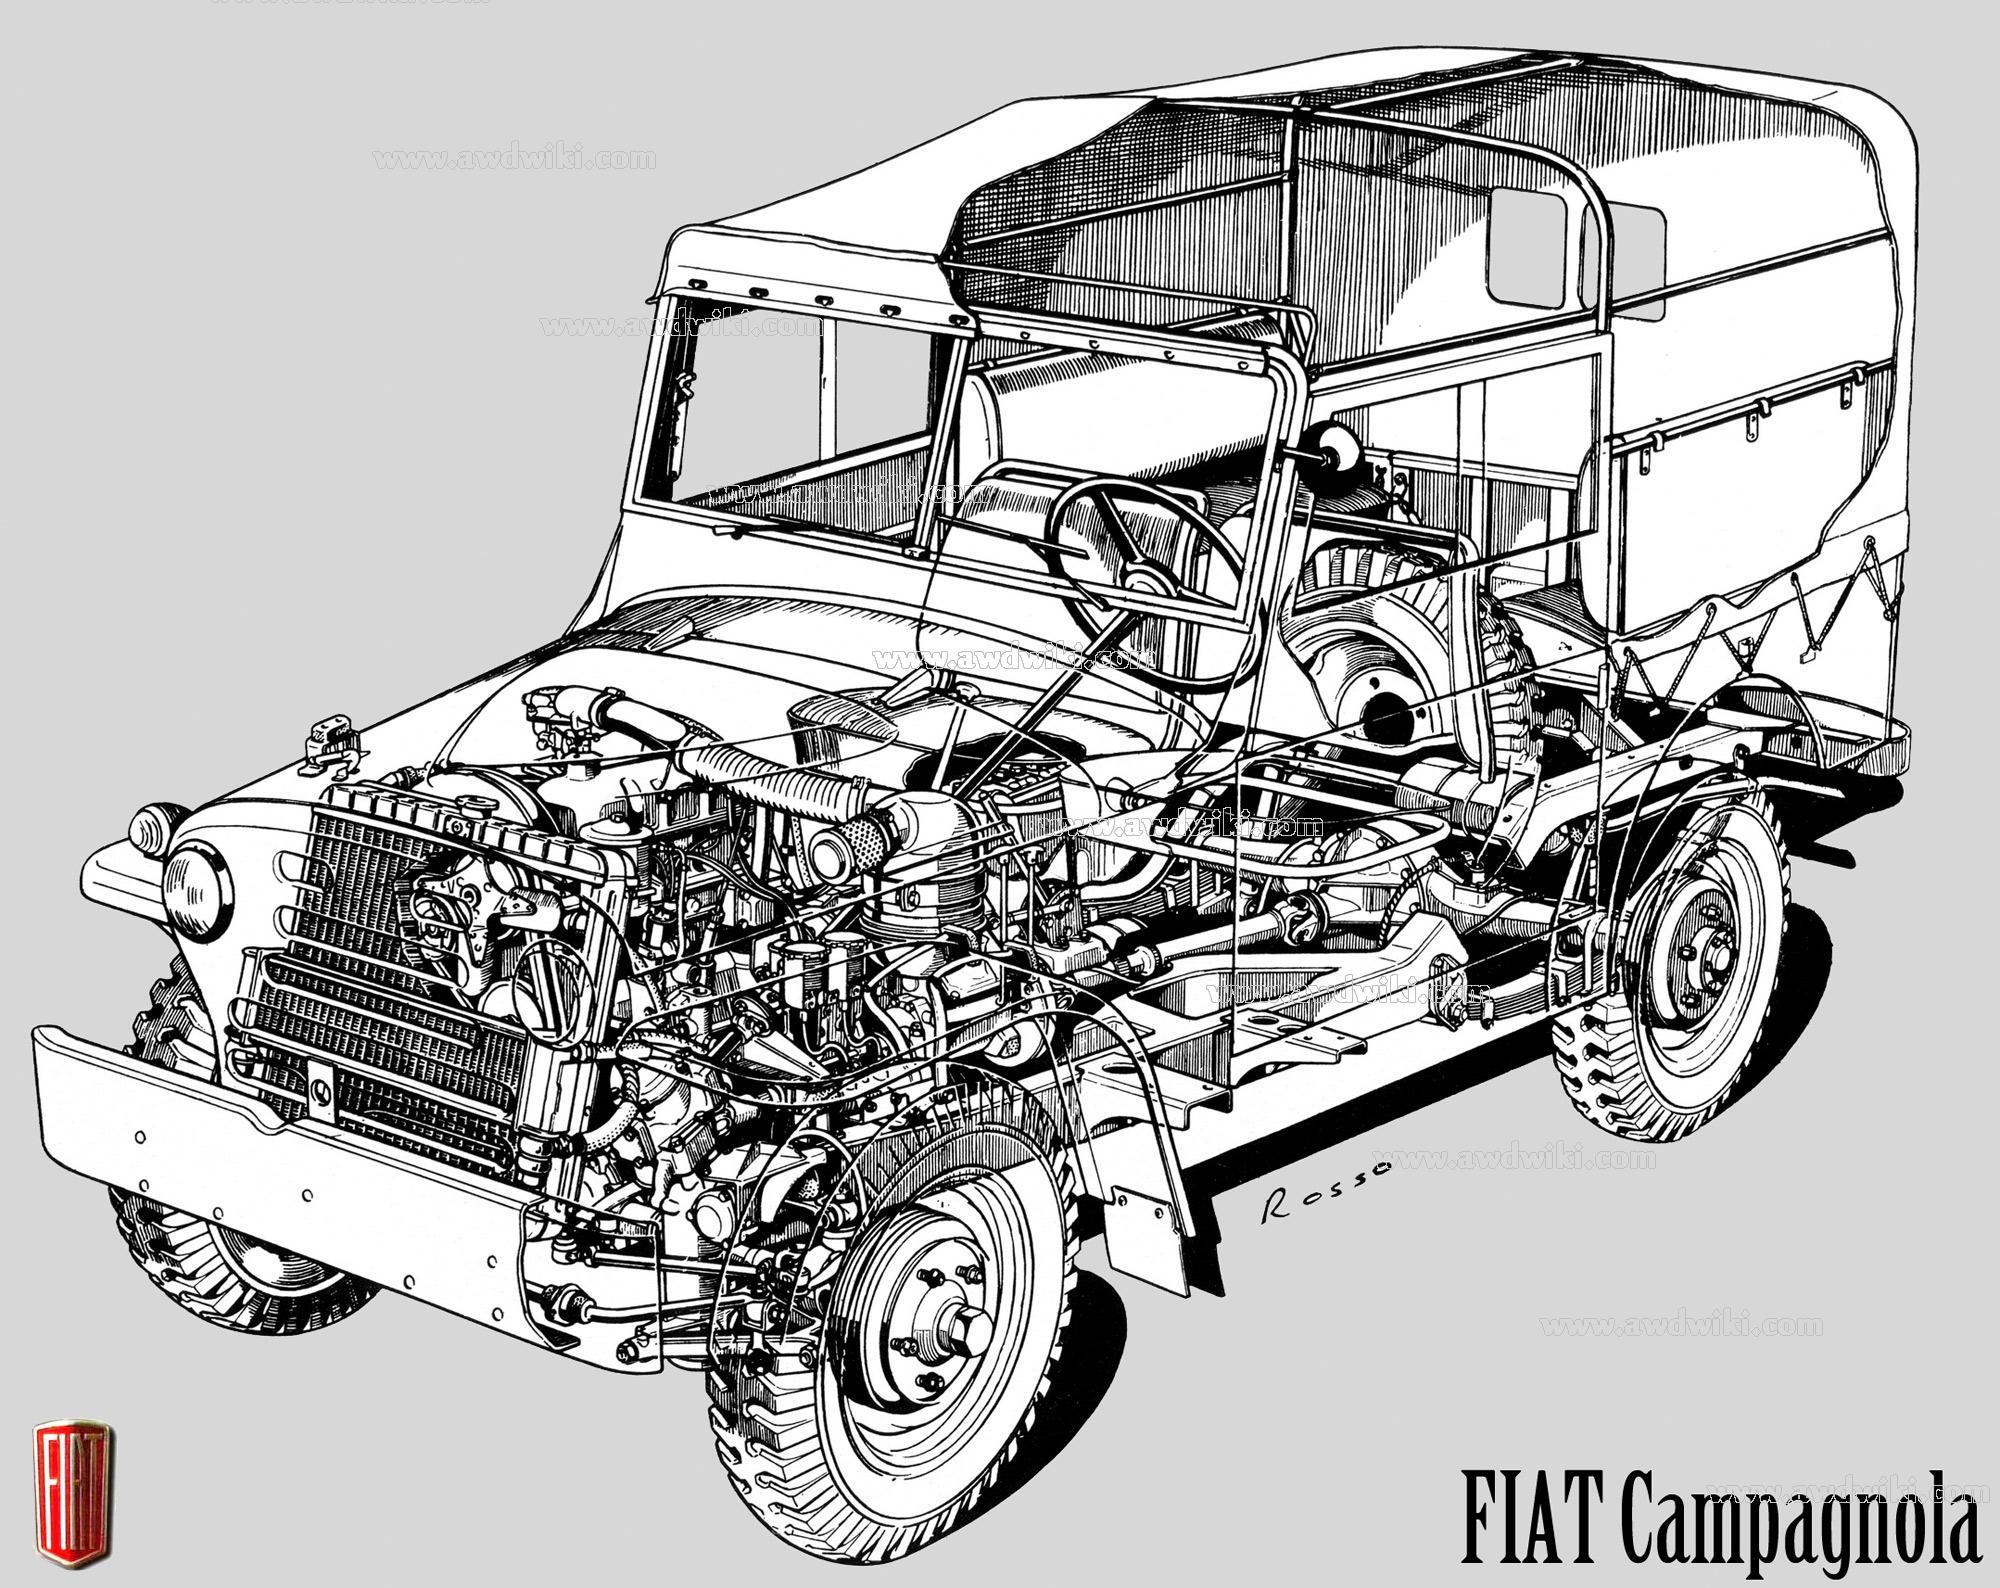 Fiat all wheel drive explained awd cars 4x4 vehicles 4wd trucks 4motion quattro xdrive